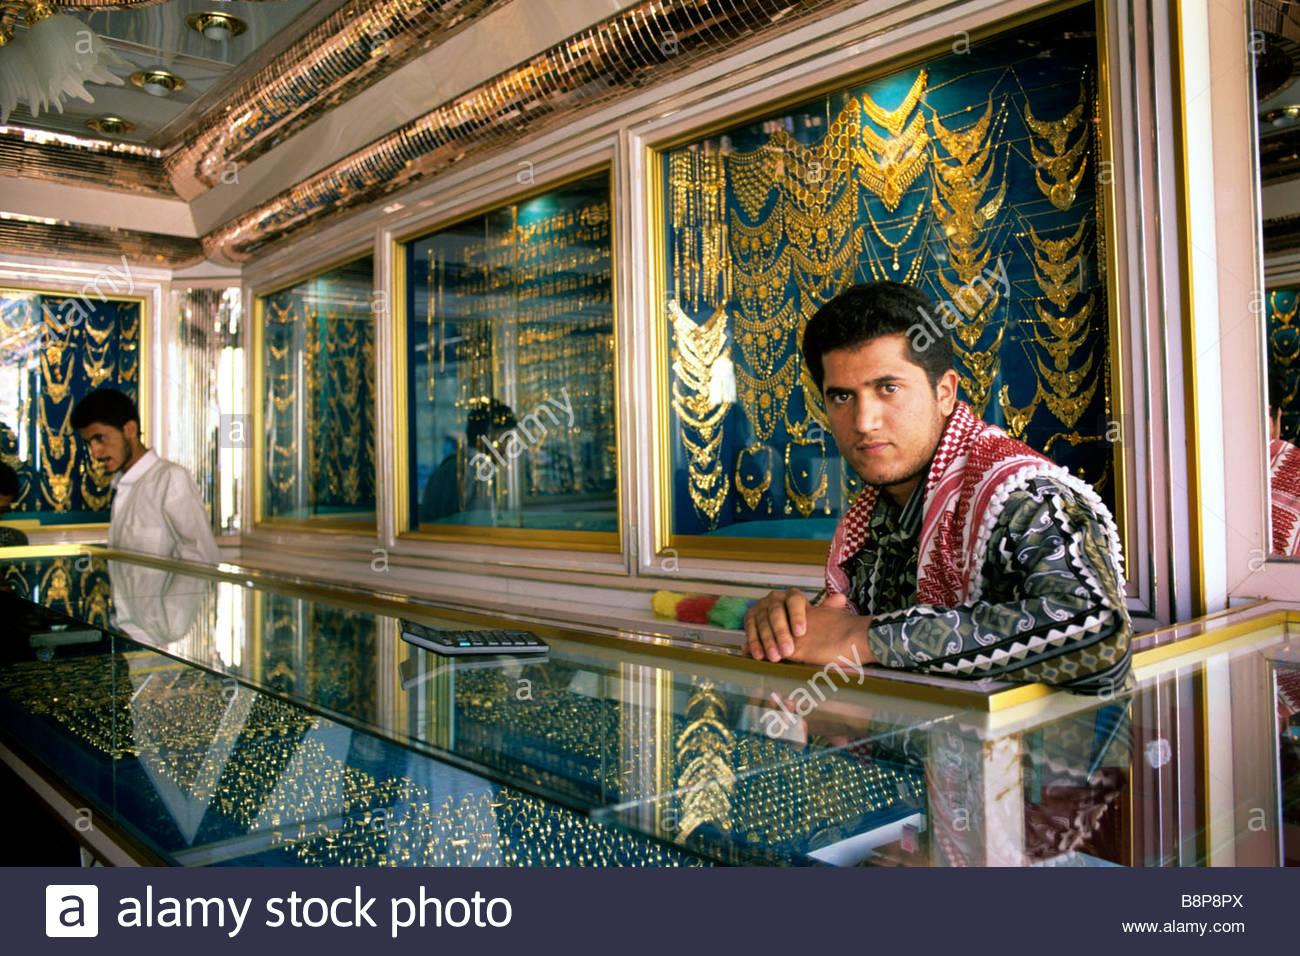 jeweller shop, yemen, arabian peninsula - Stock Image